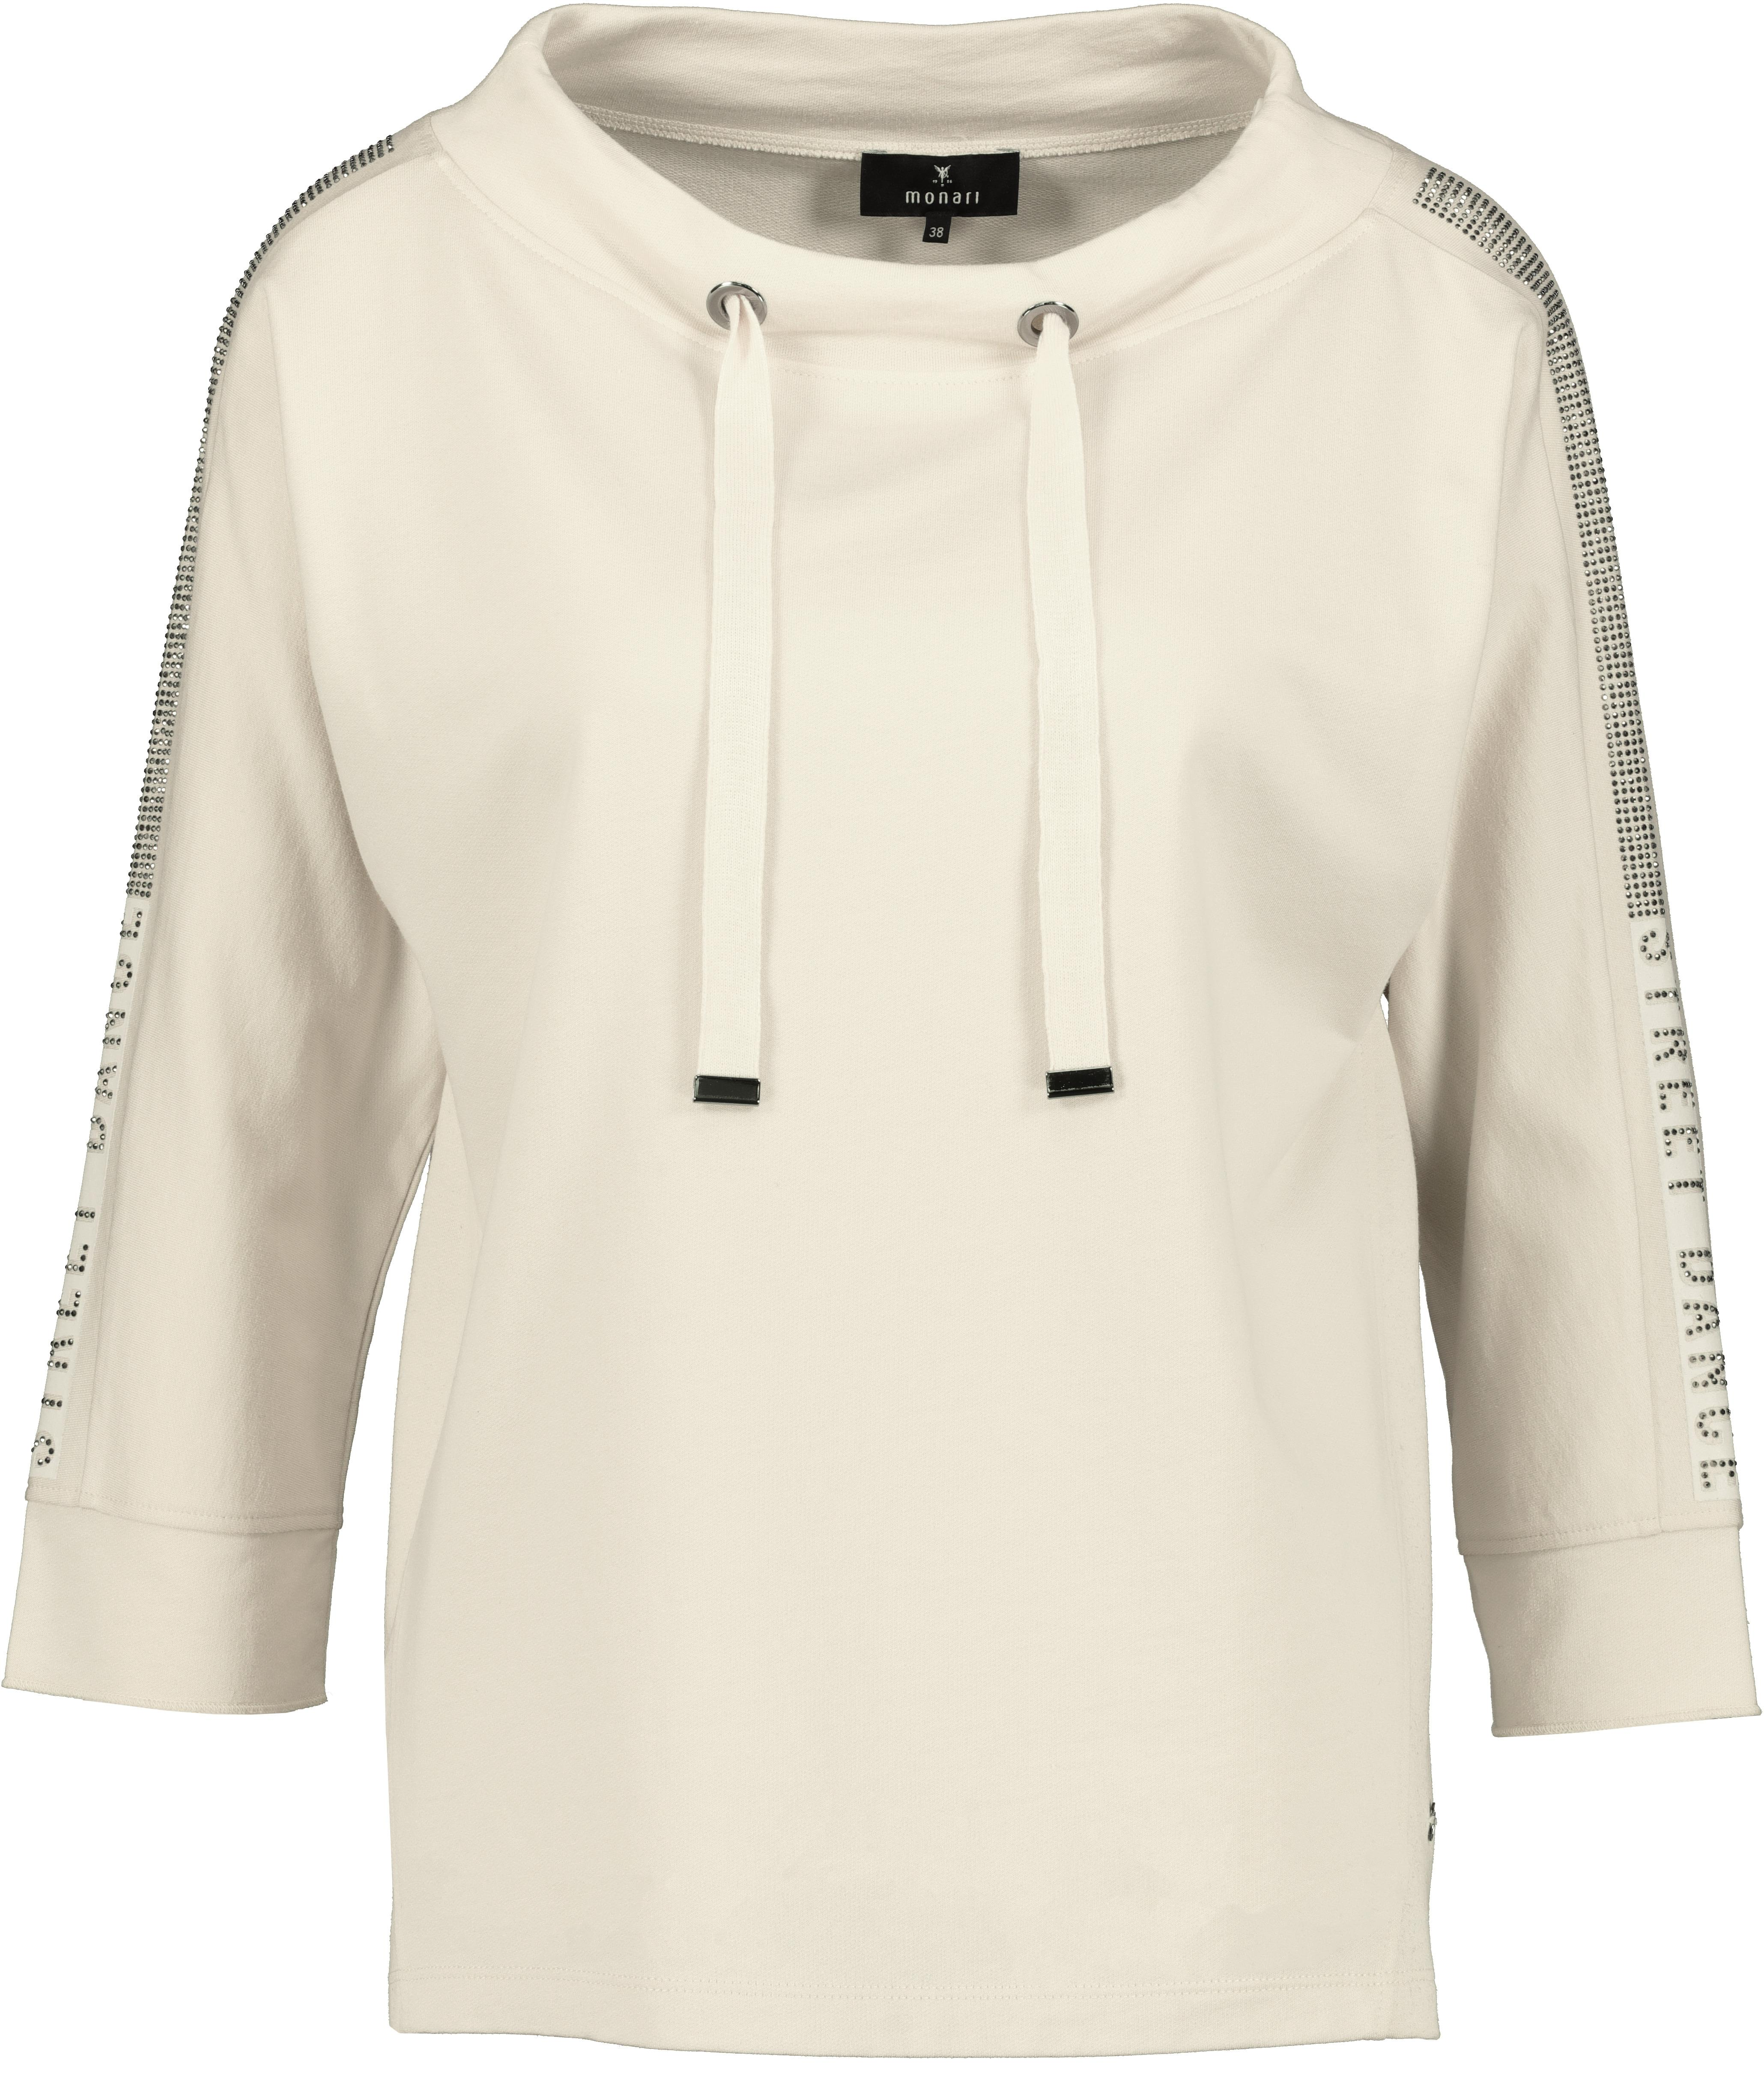 Monari Sweatshirt